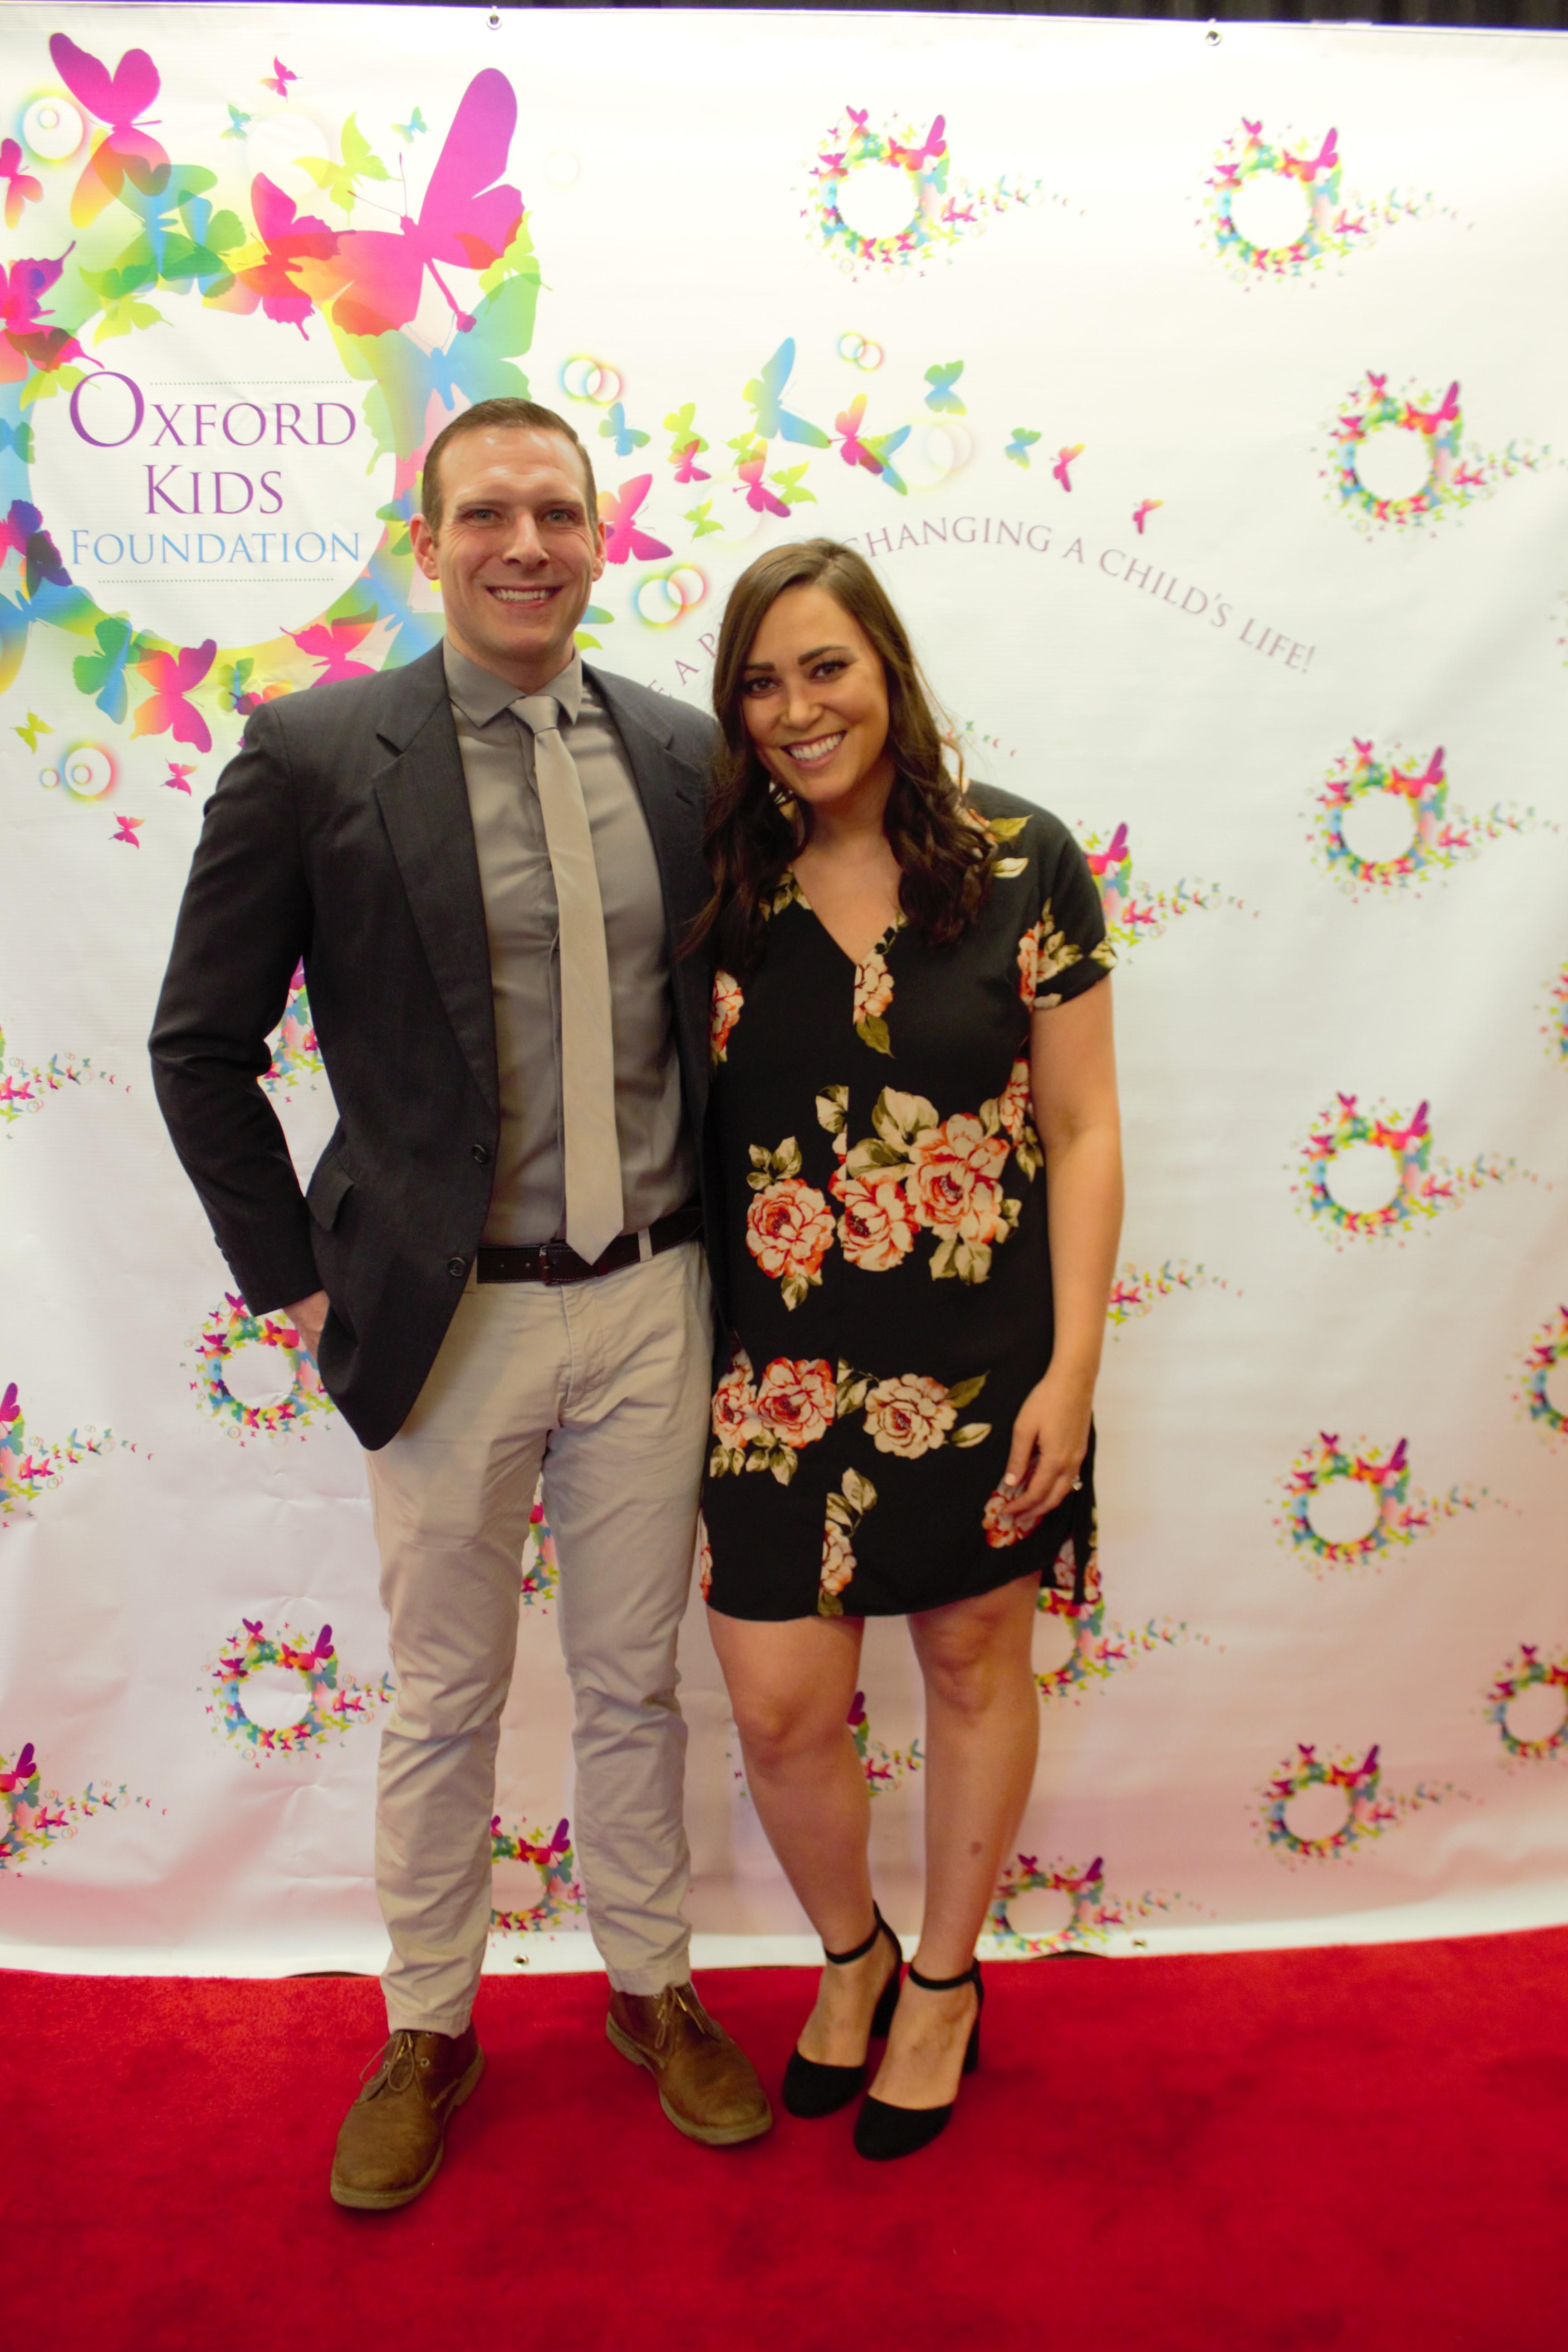 Dan and Jessica Briggs